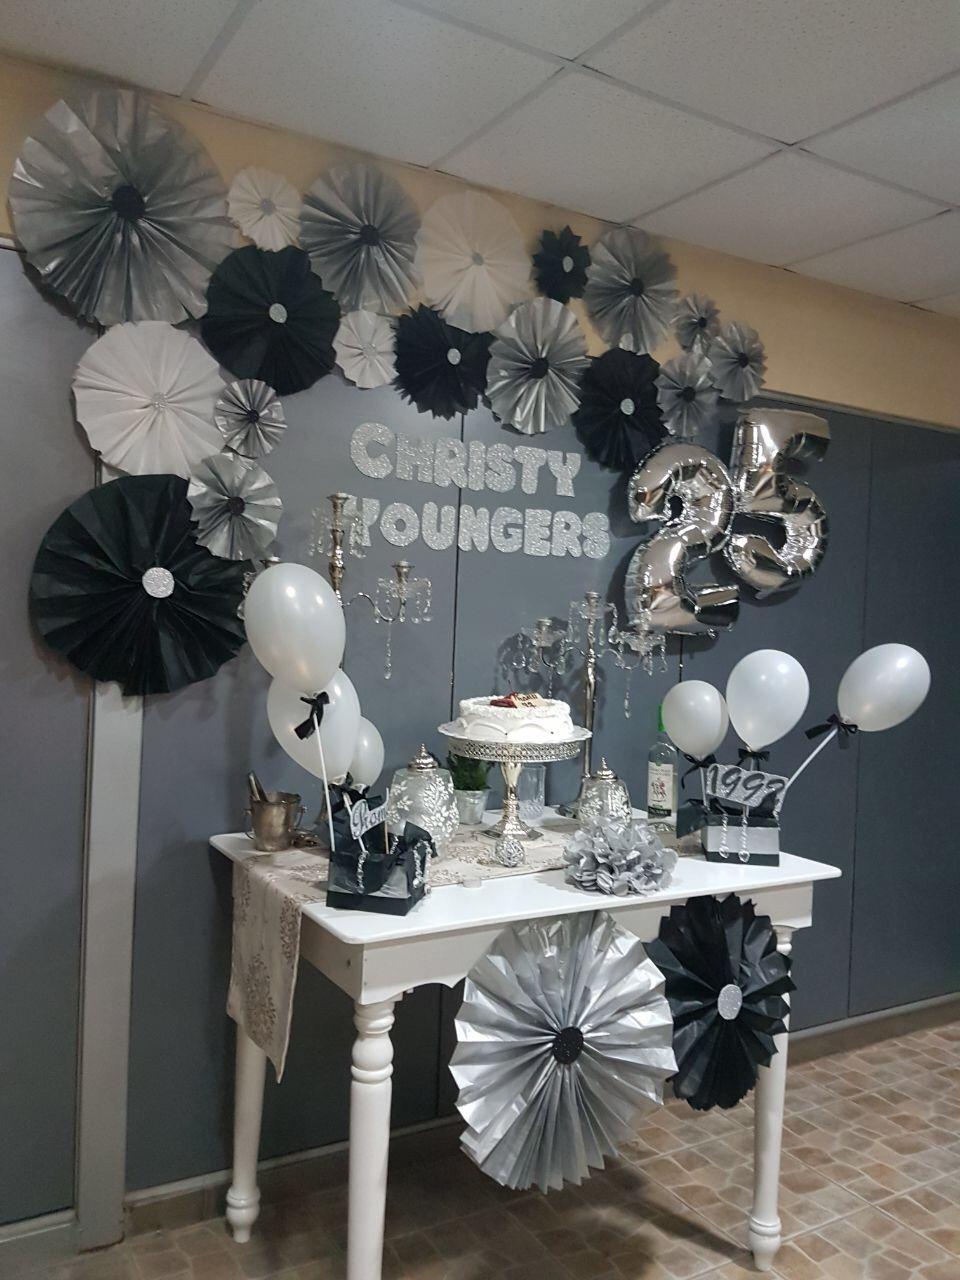 Decoraci n bodas de plata de promoci n de colegio reve - Decoracion para bodas de plata ...